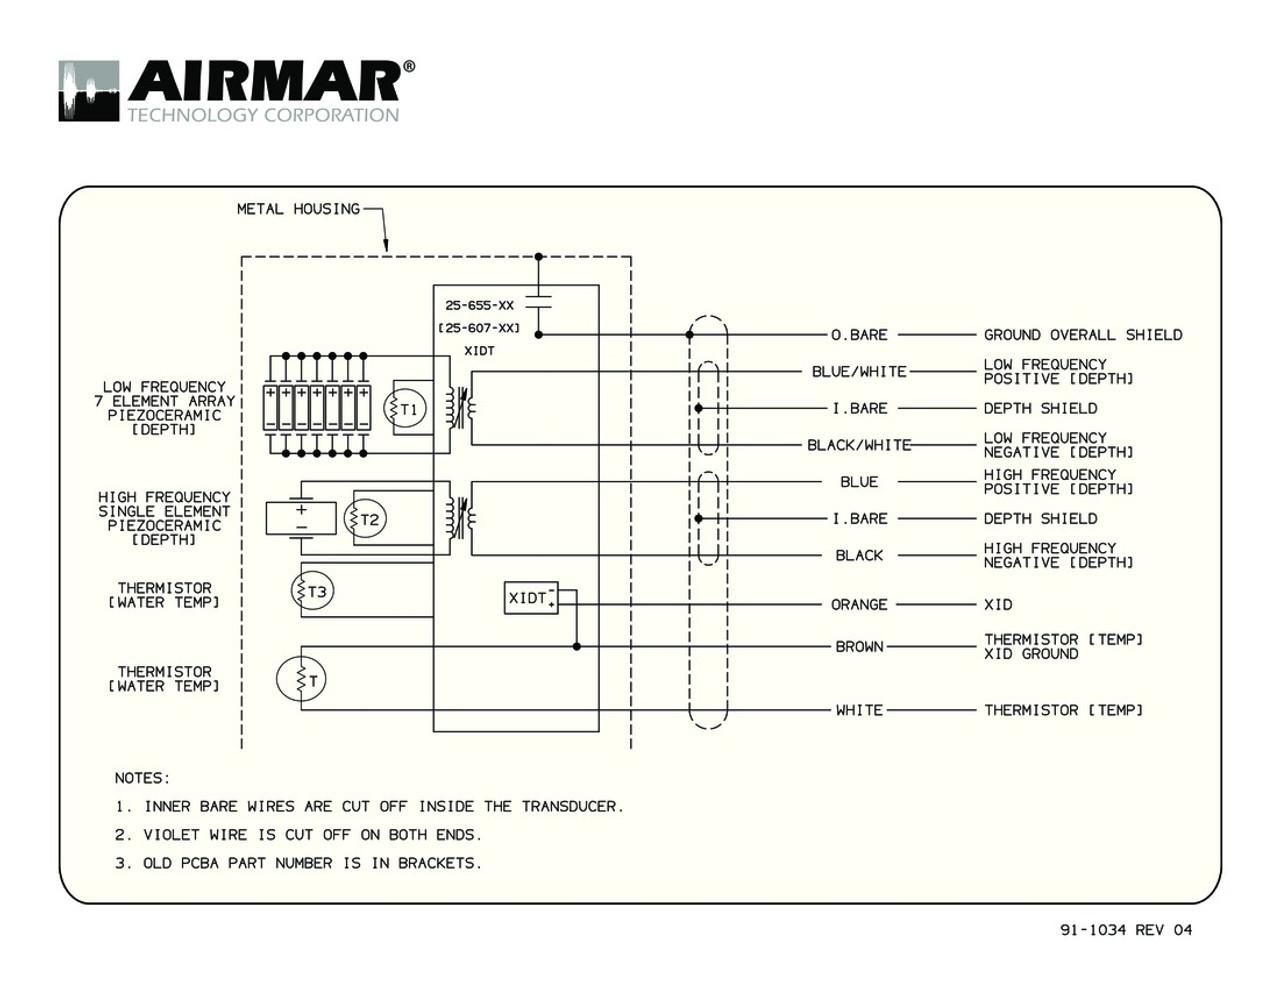 airmar wiring diagrams wiring diagram post Pressure Transducer Wiring